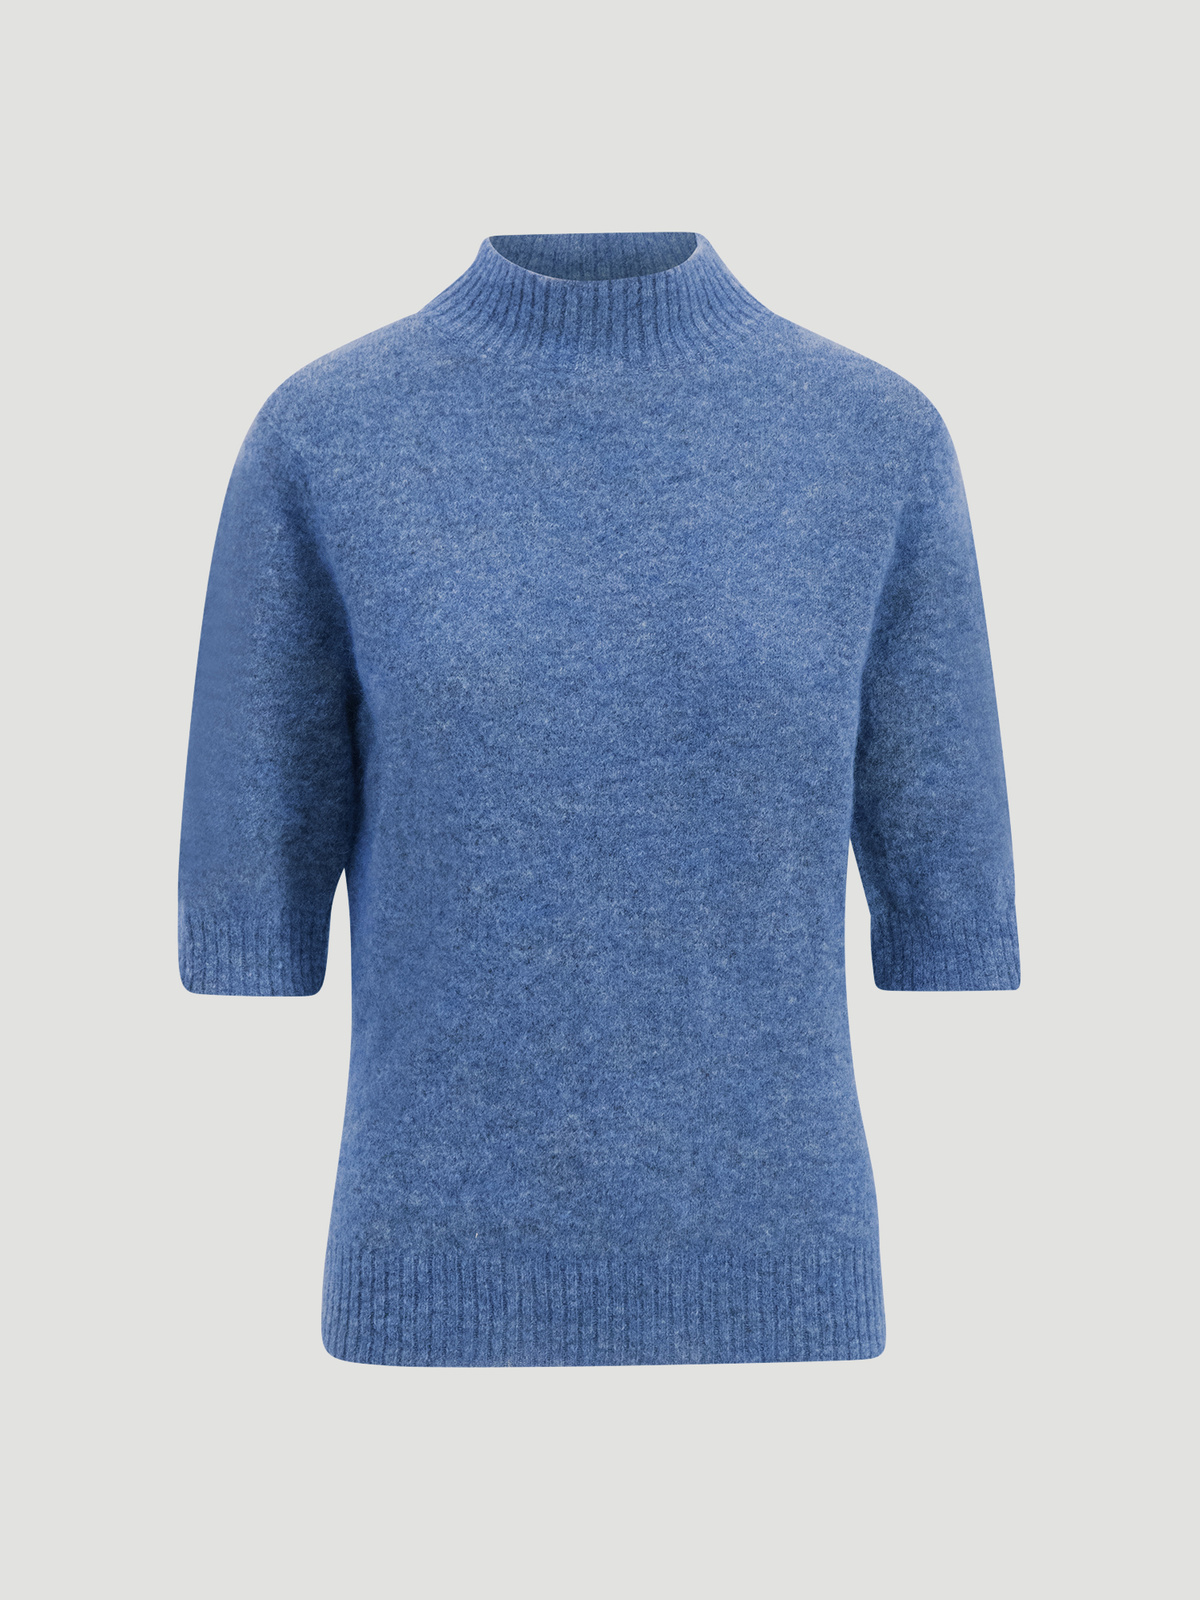 Puff Knit Tee  Blue 5